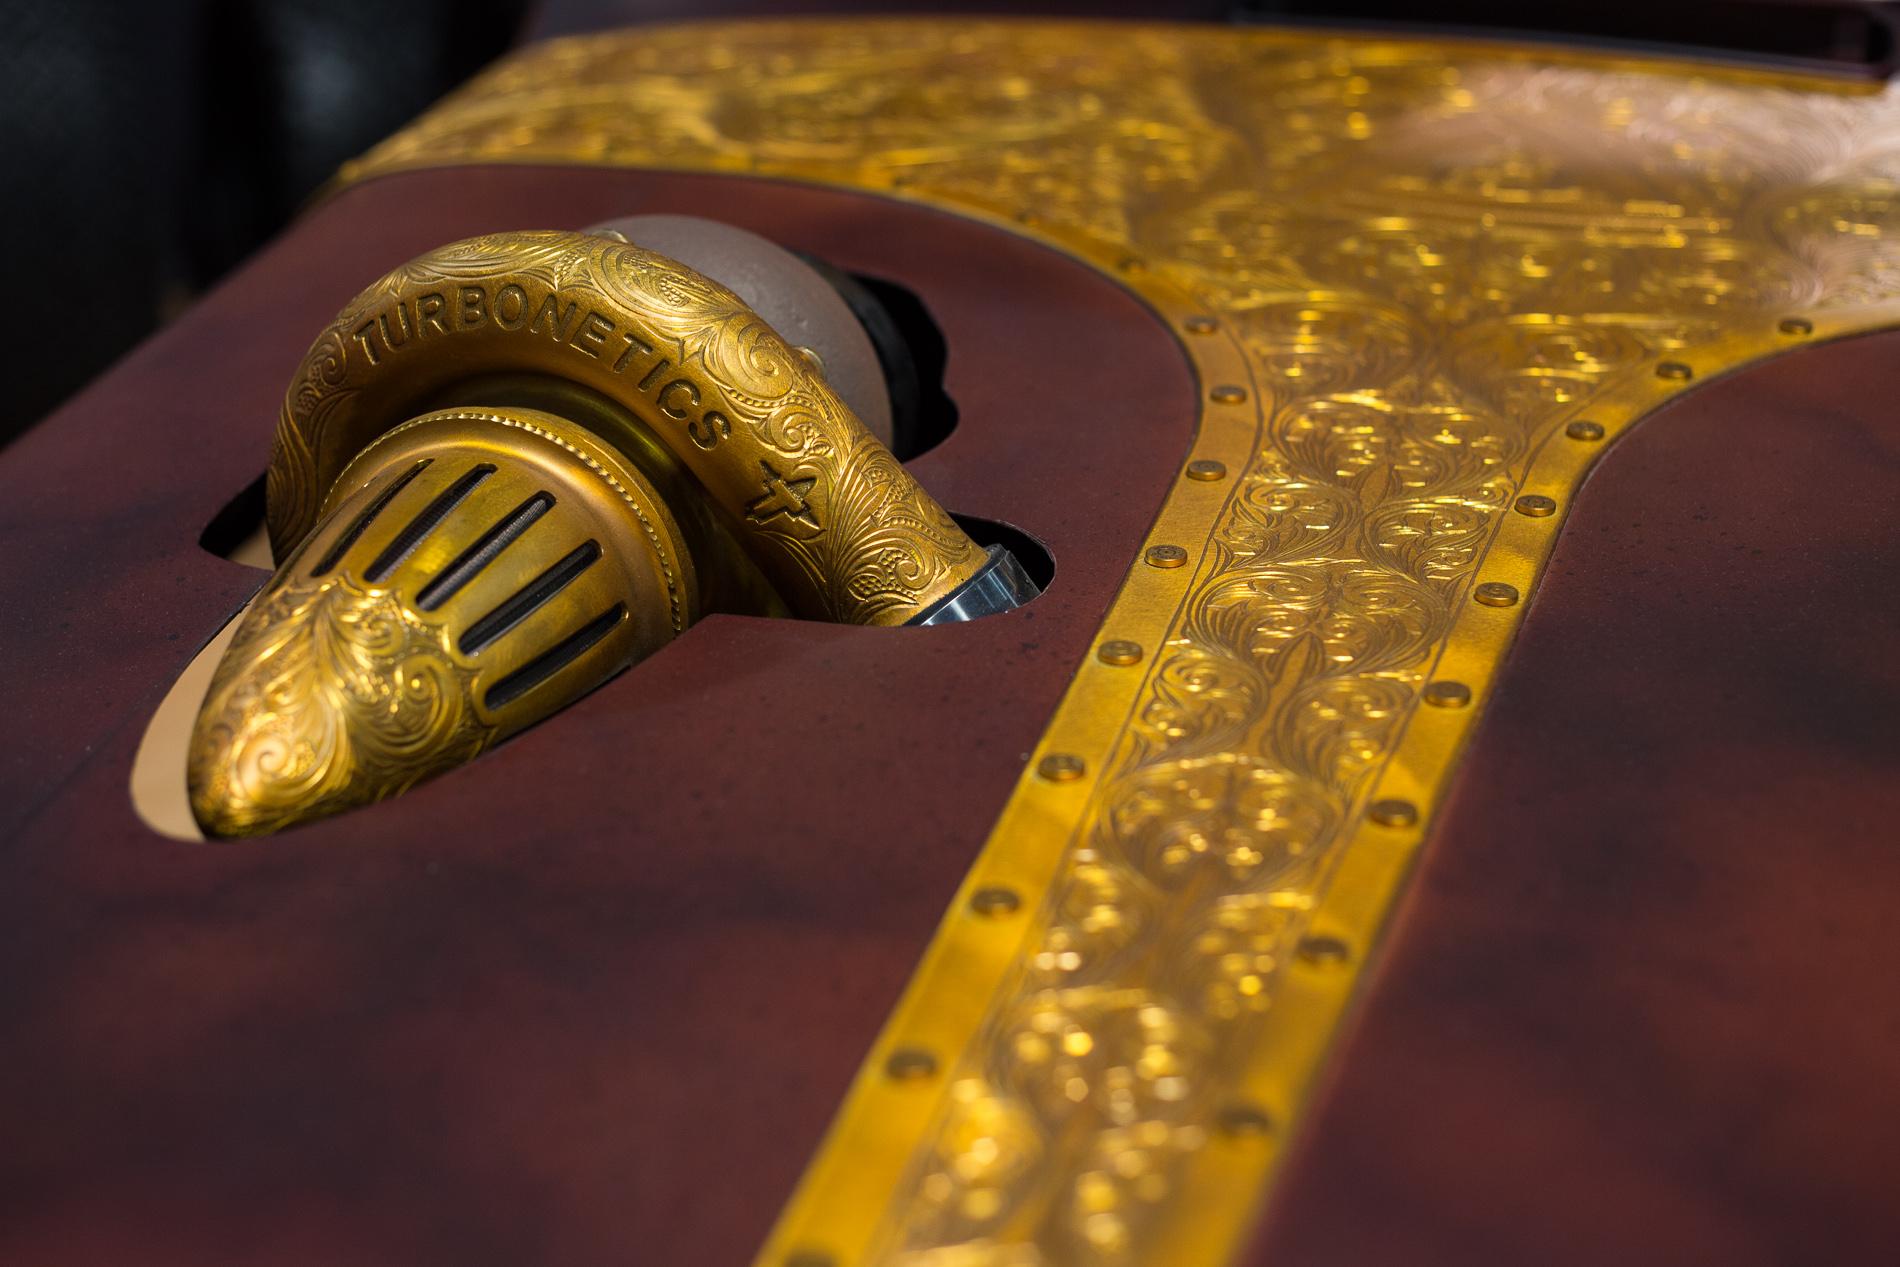 detailing rochester